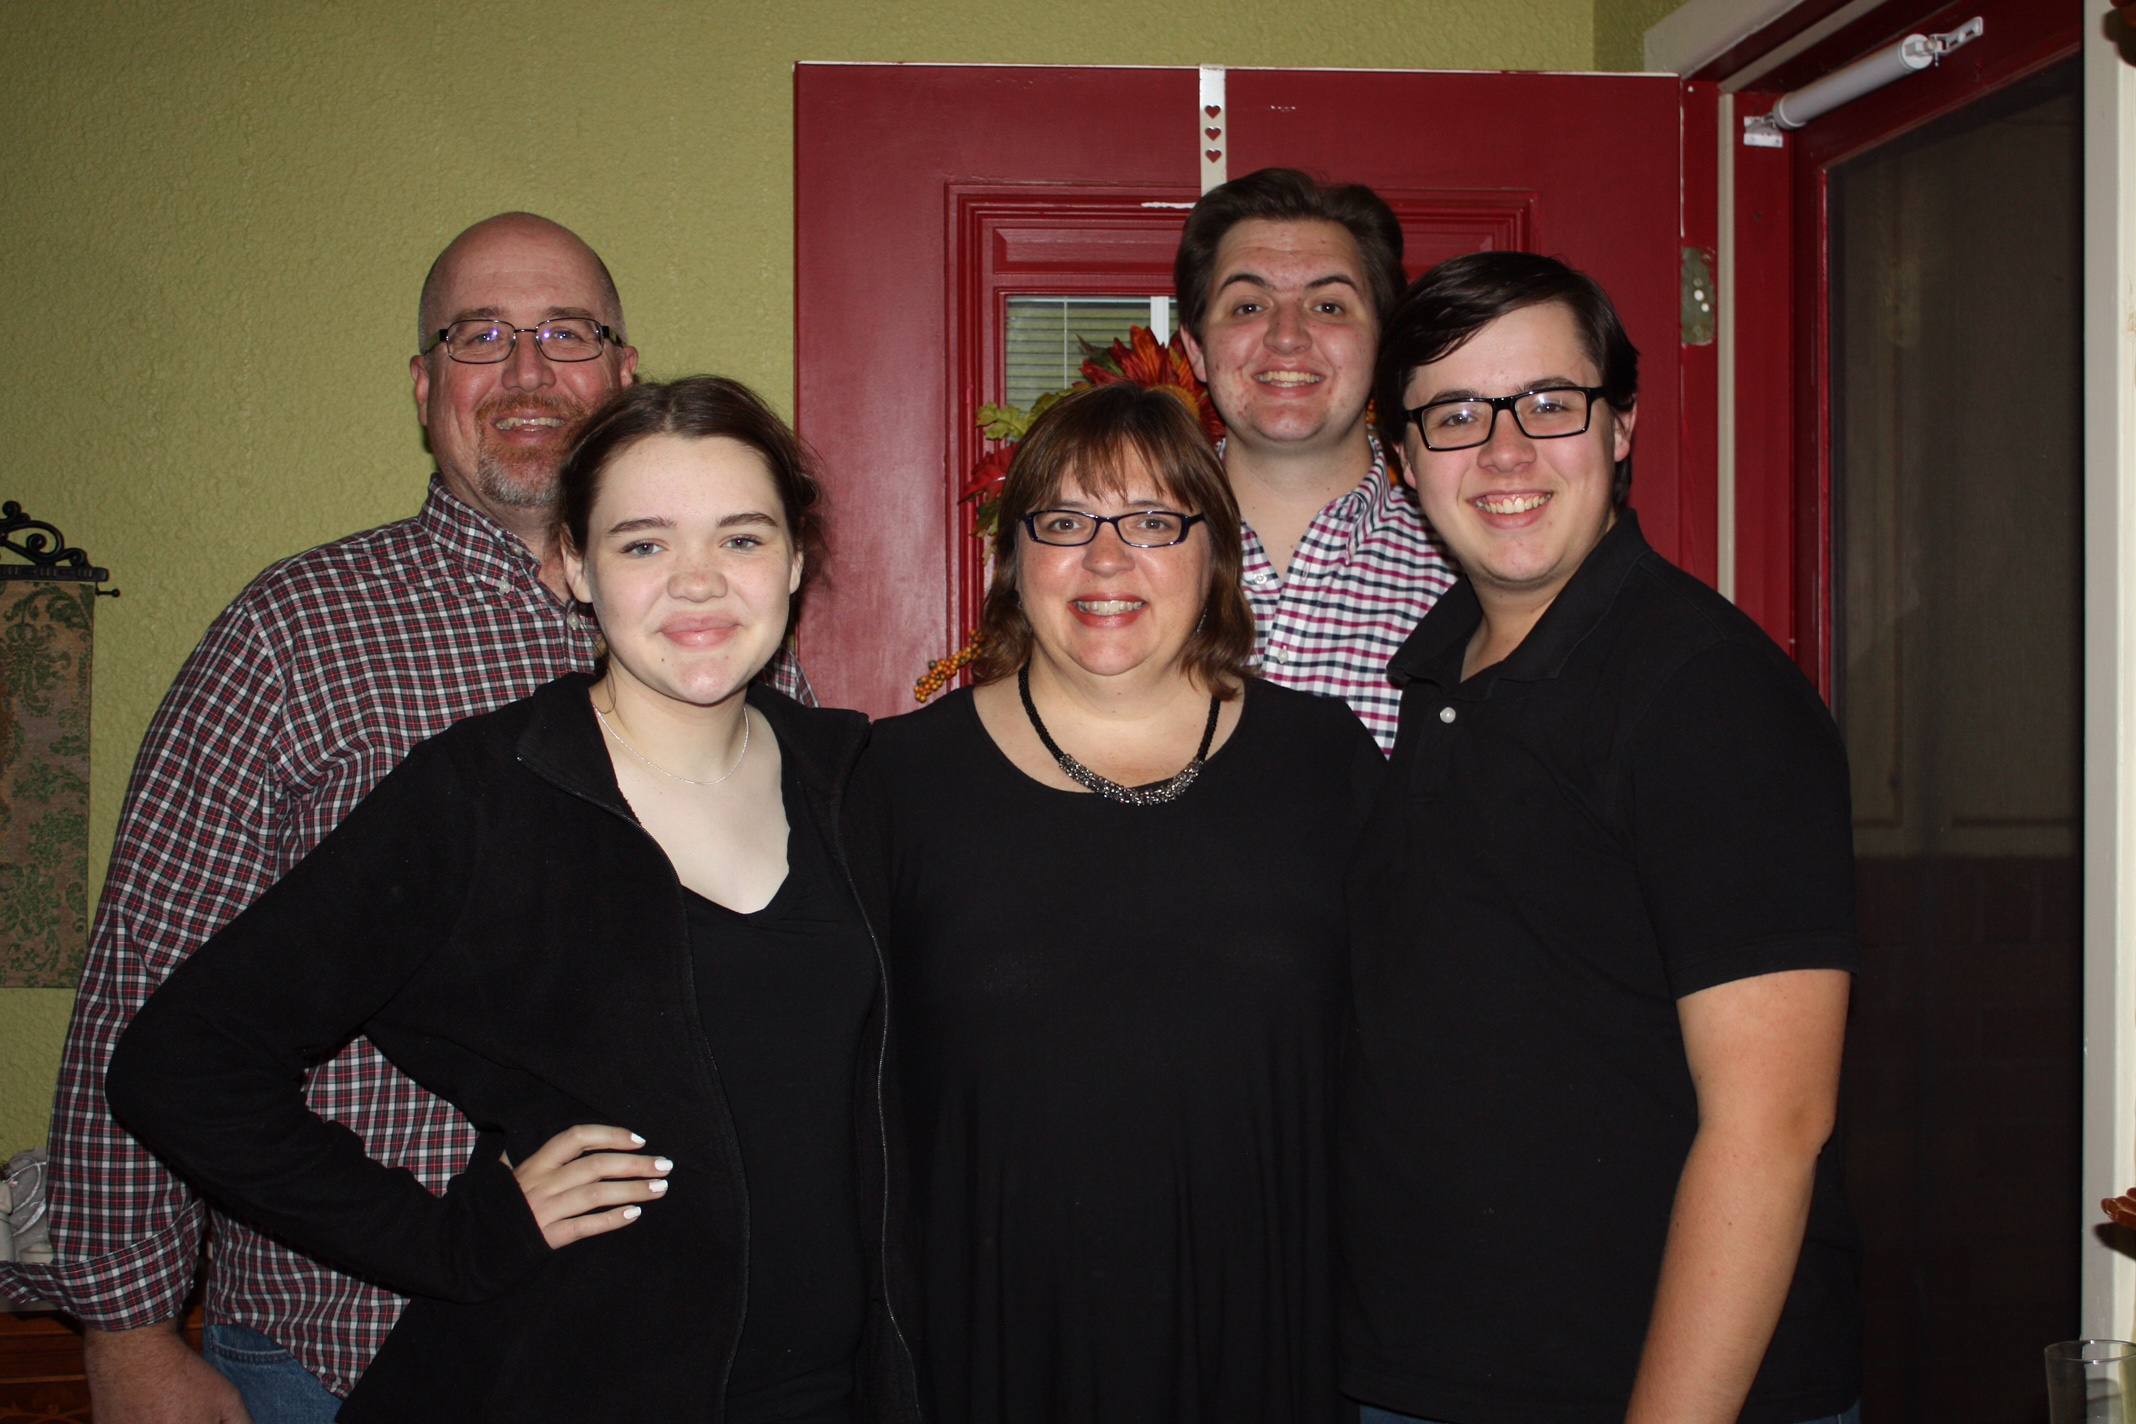 John & Linda, with children Thomas, Daniel, & Hannah